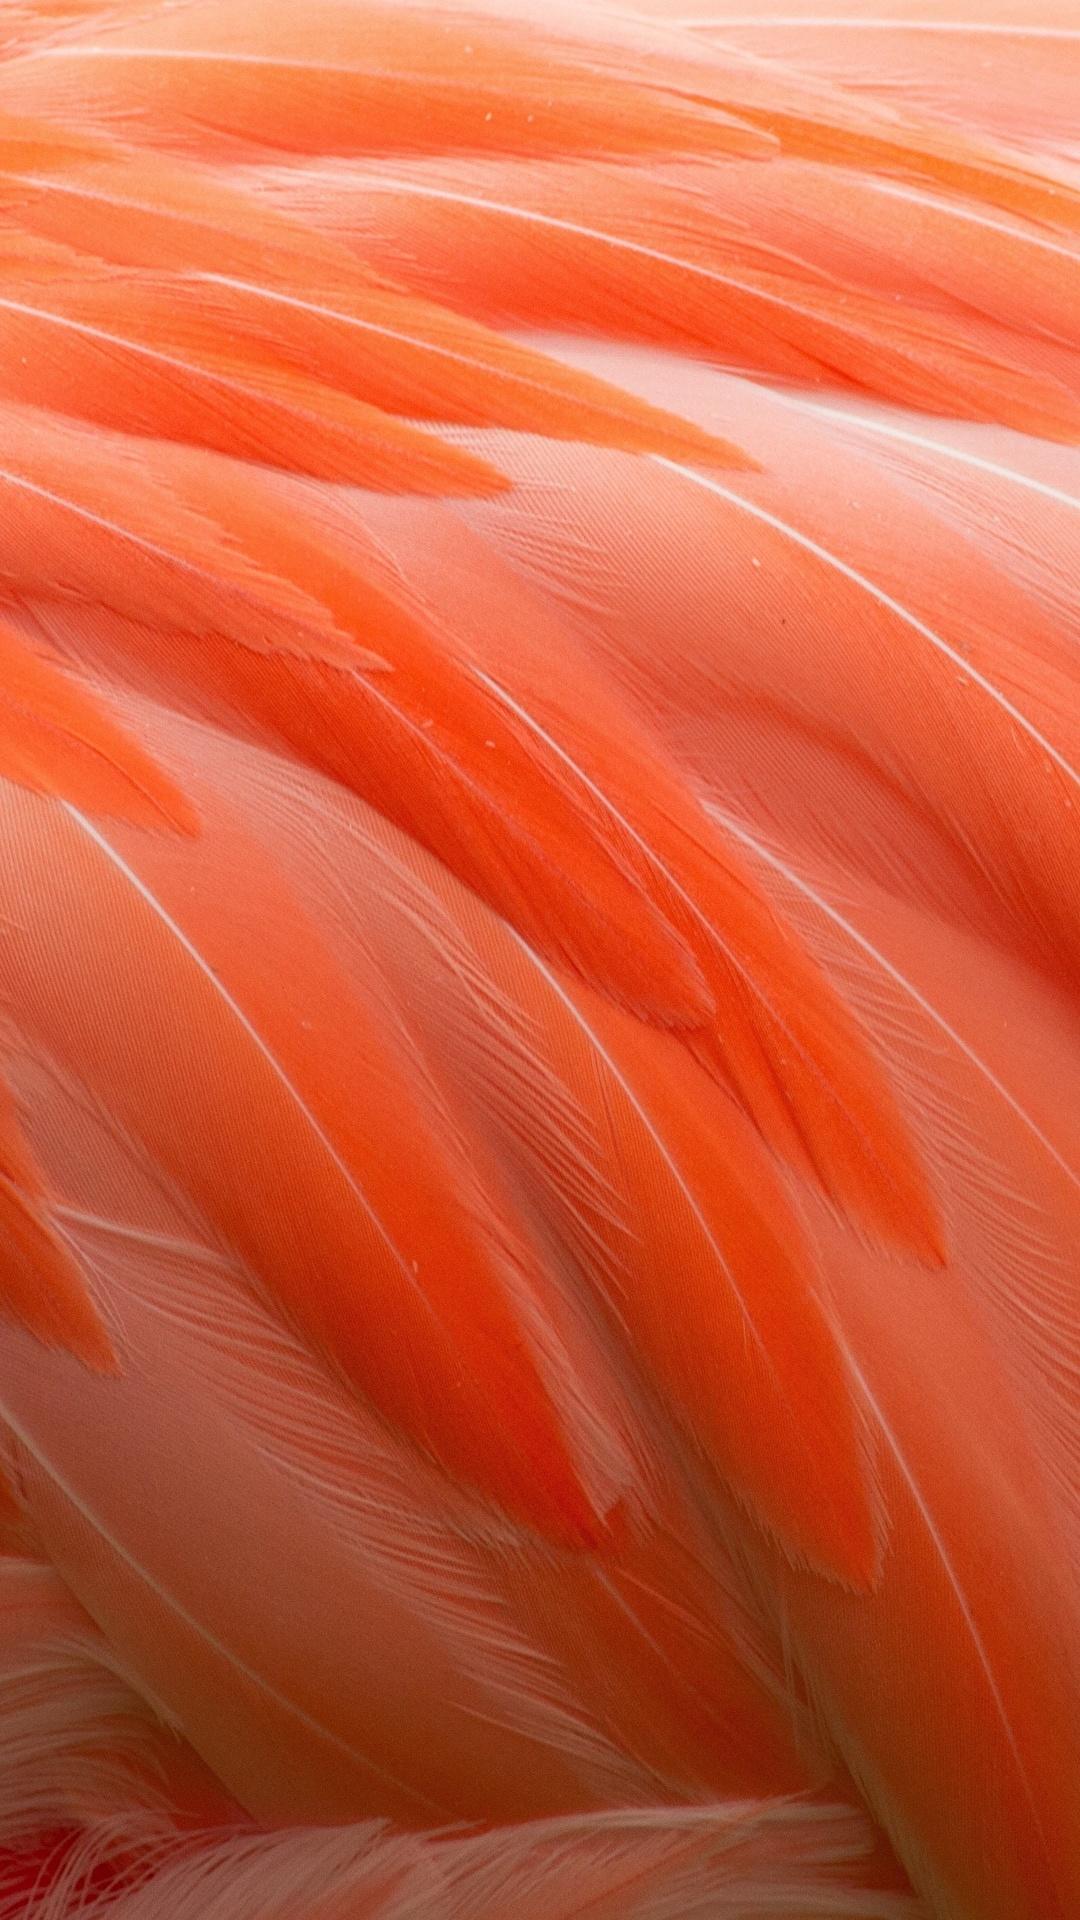 Wallpaper Flamingo Orange Macro Feathers 1080x1920 1080x1920